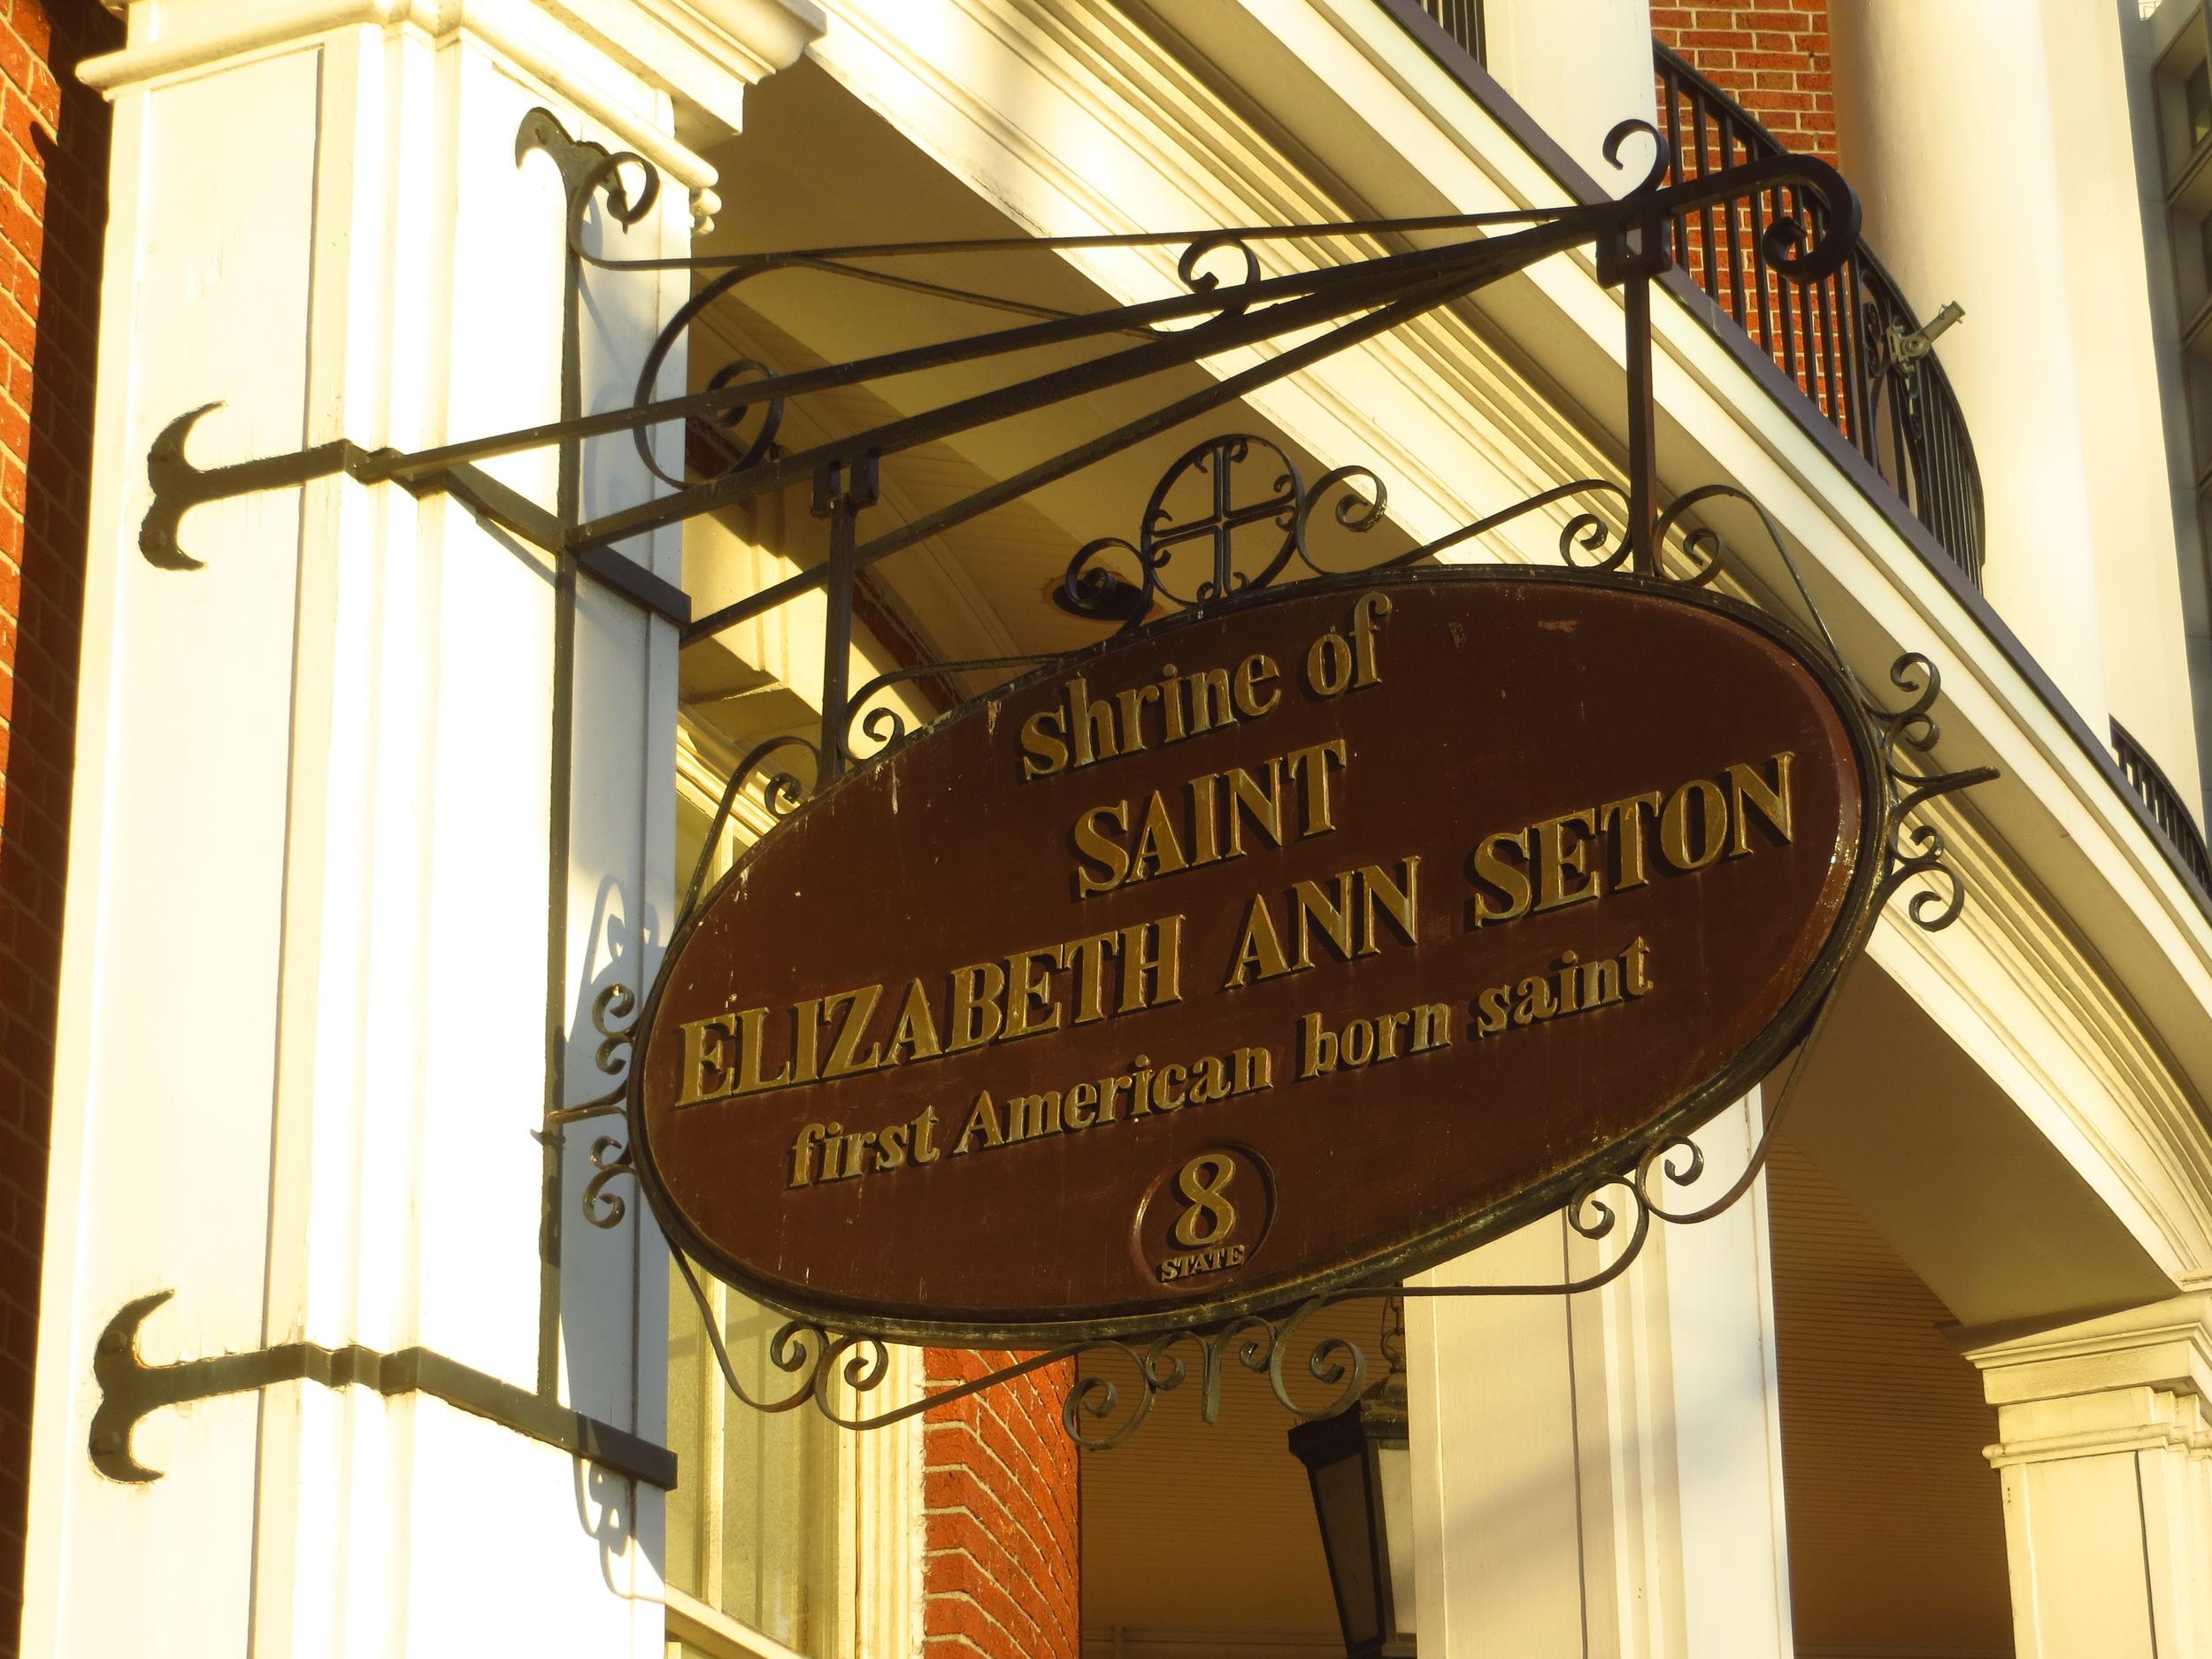 First American-born Saint